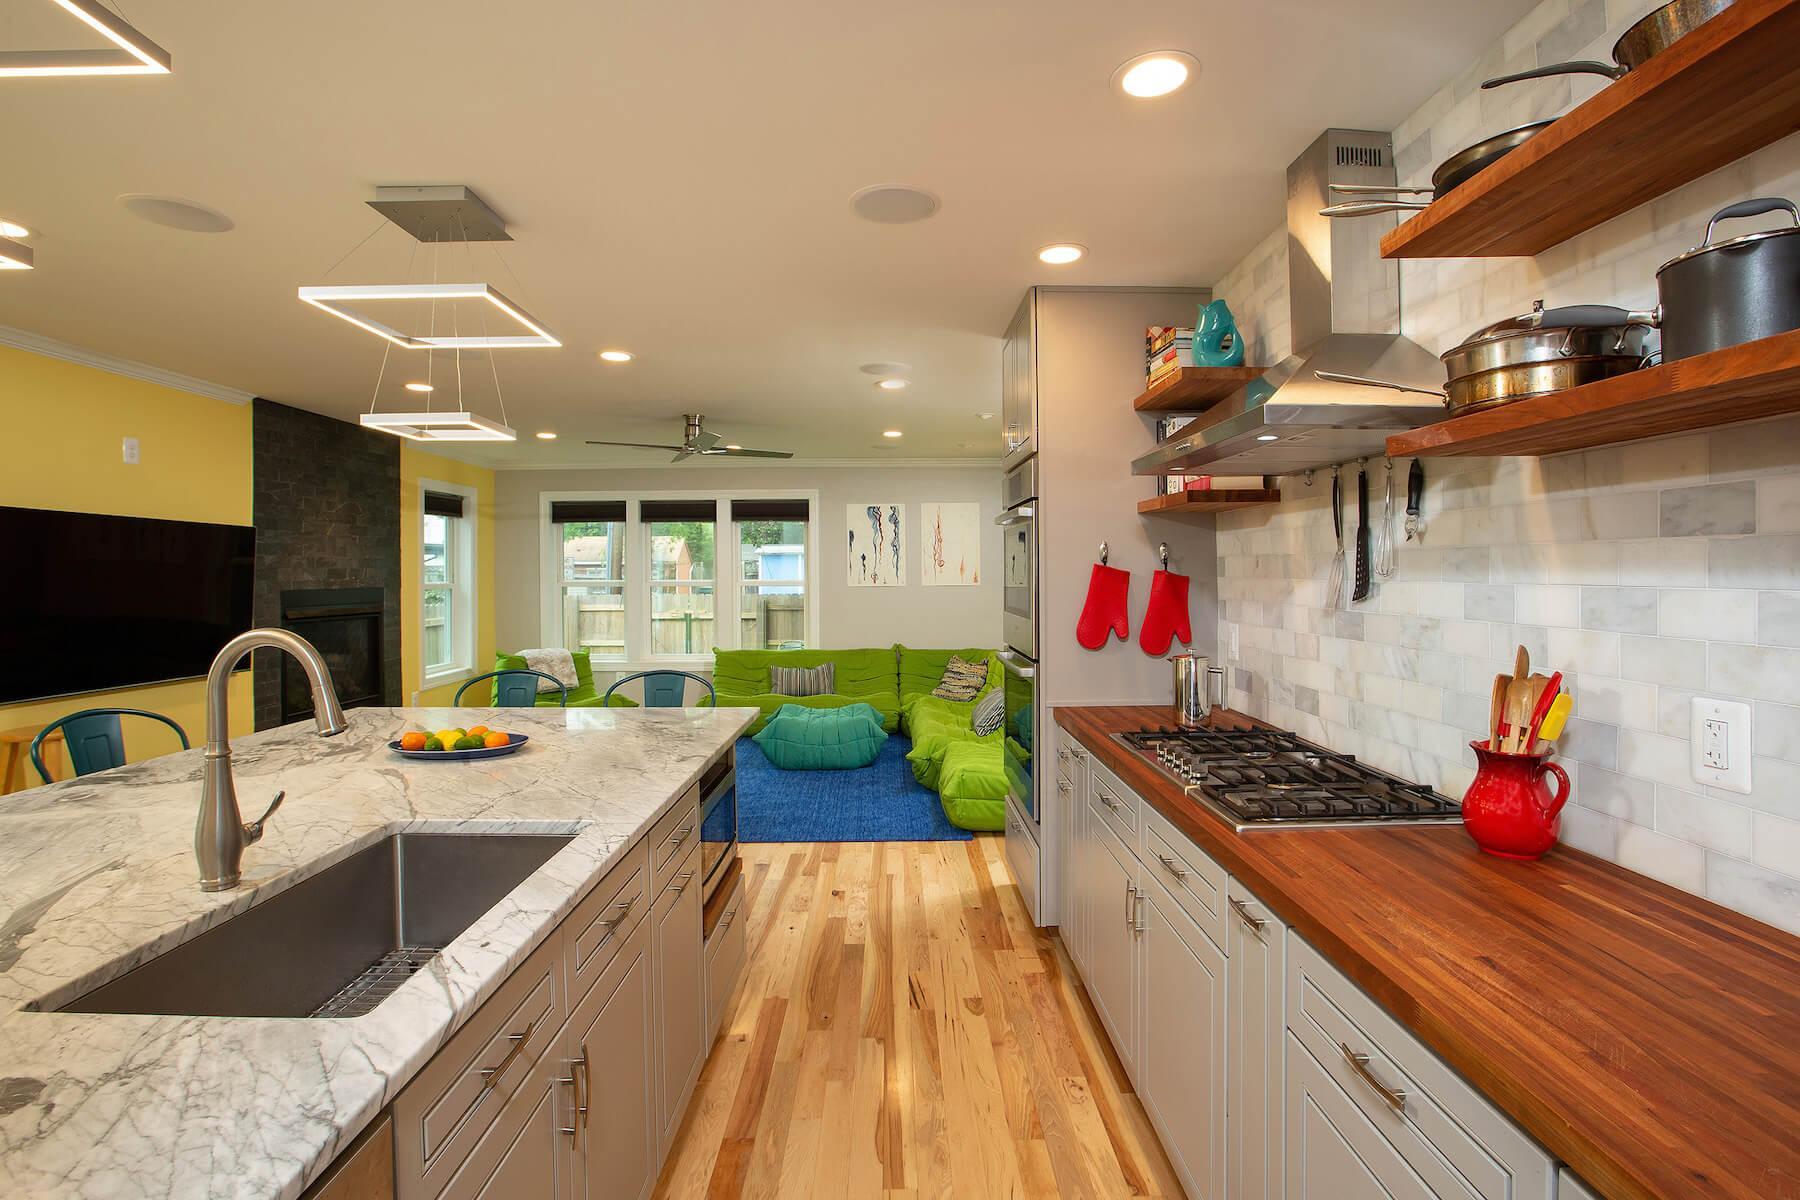 kitchen.livingroom_5-17-19_223-1